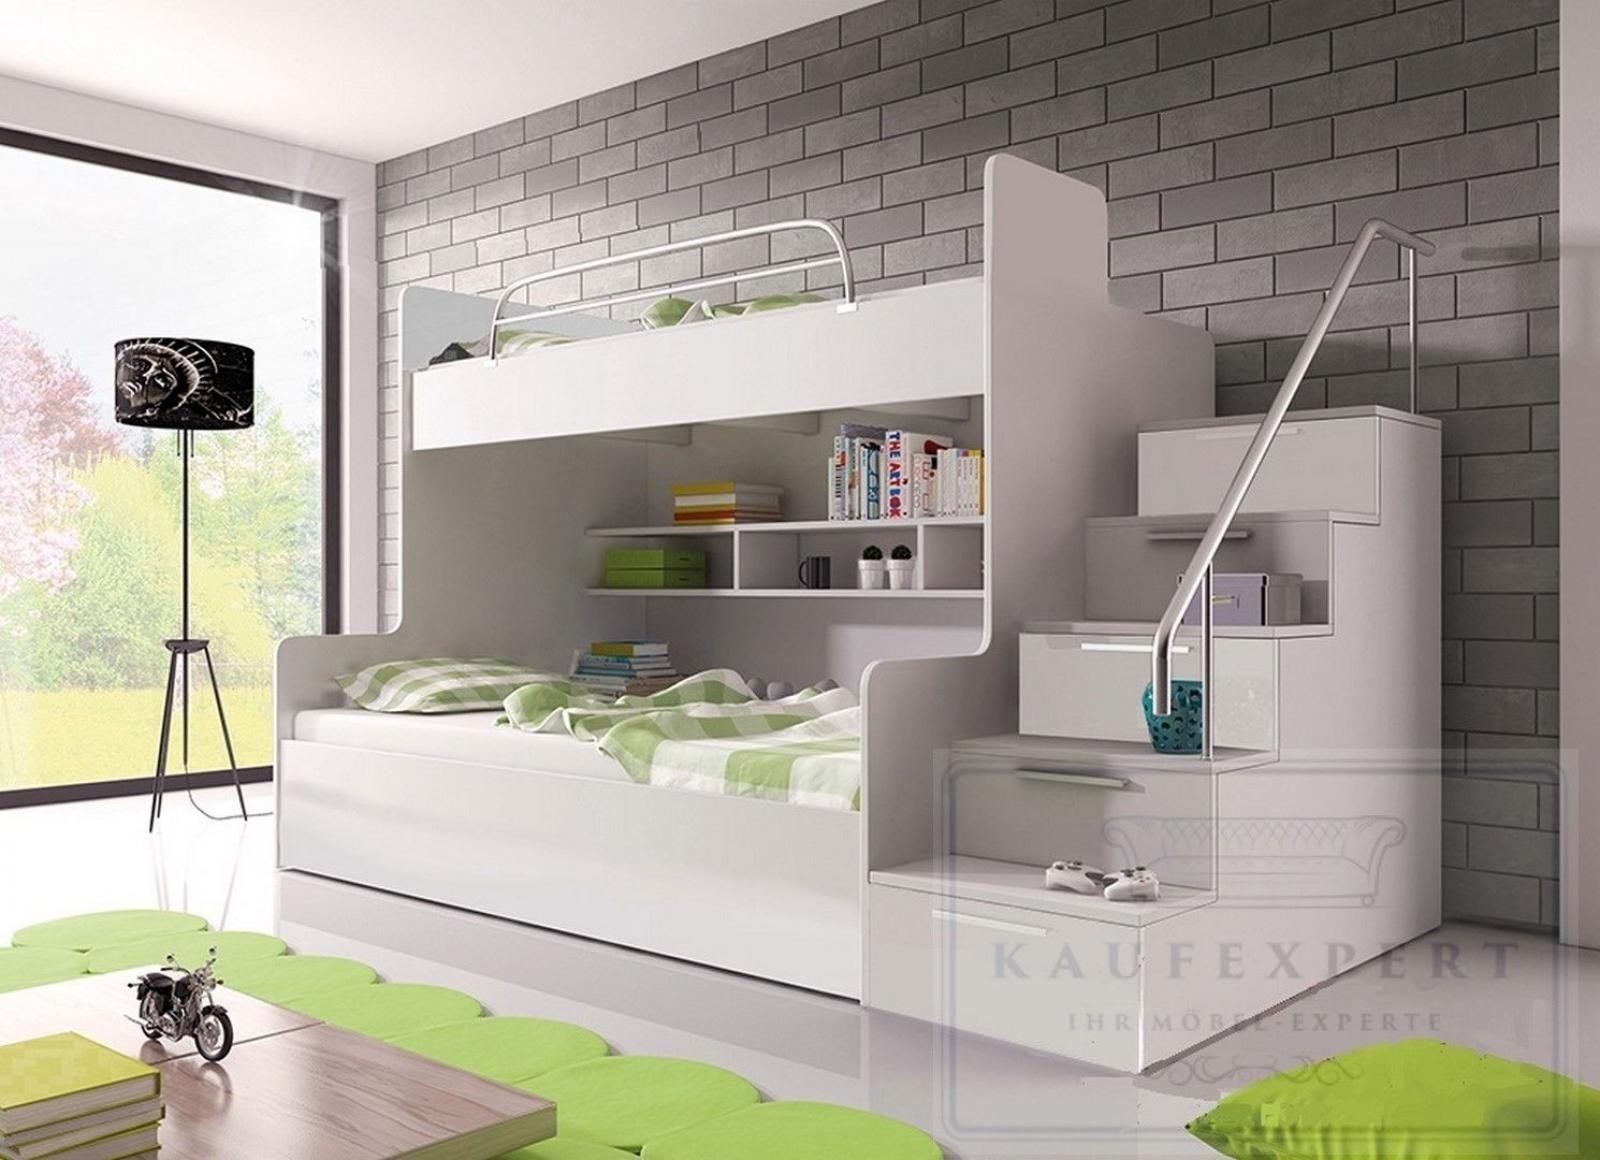 kaufexpert doppelstockbetten. Black Bedroom Furniture Sets. Home Design Ideas